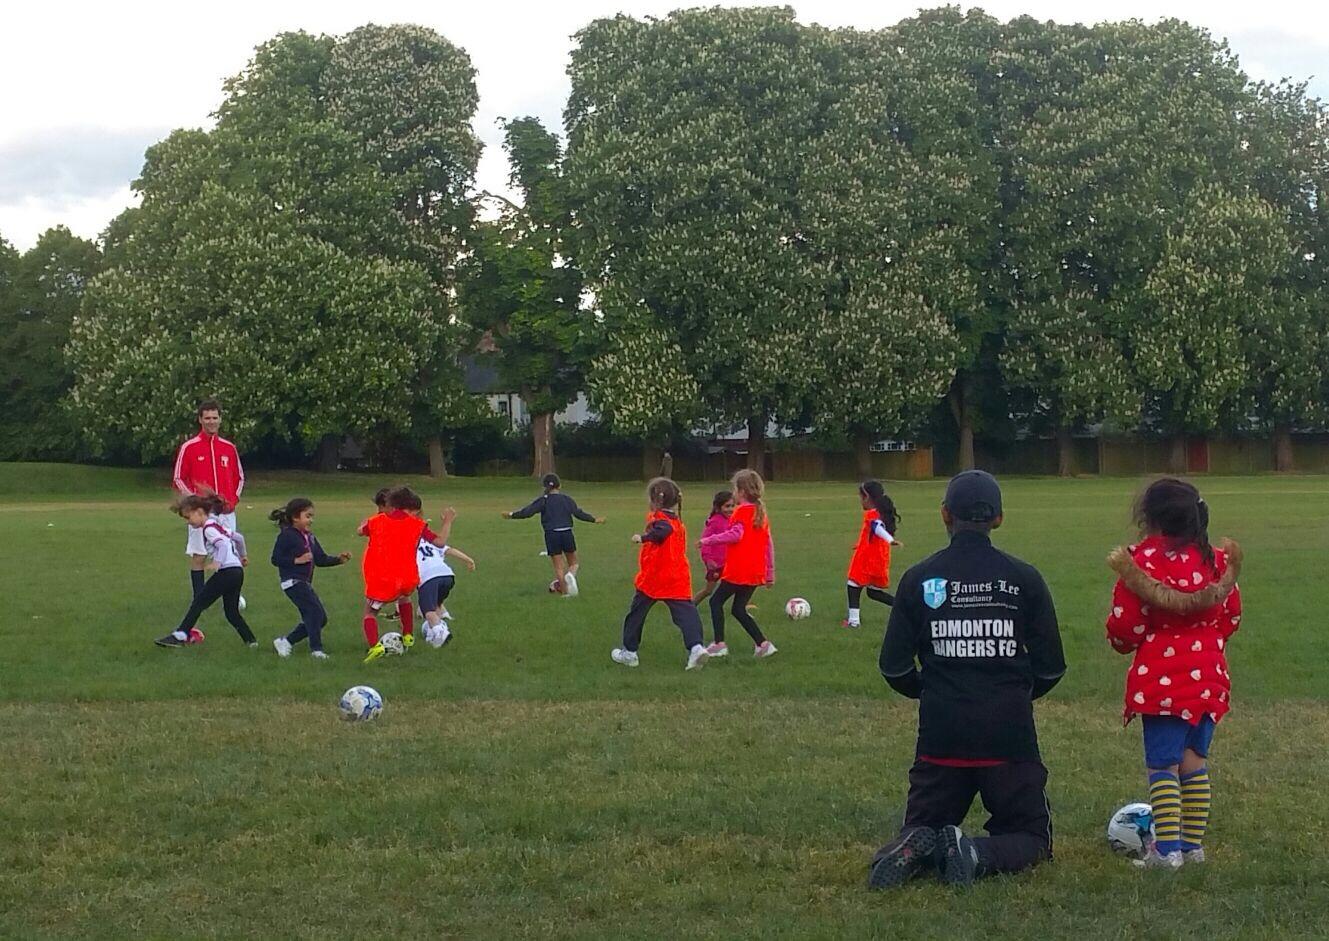 Edmonton Rangers Cheetahs - U7 Girls development team - fun football sessions for 5 & 6 year olds